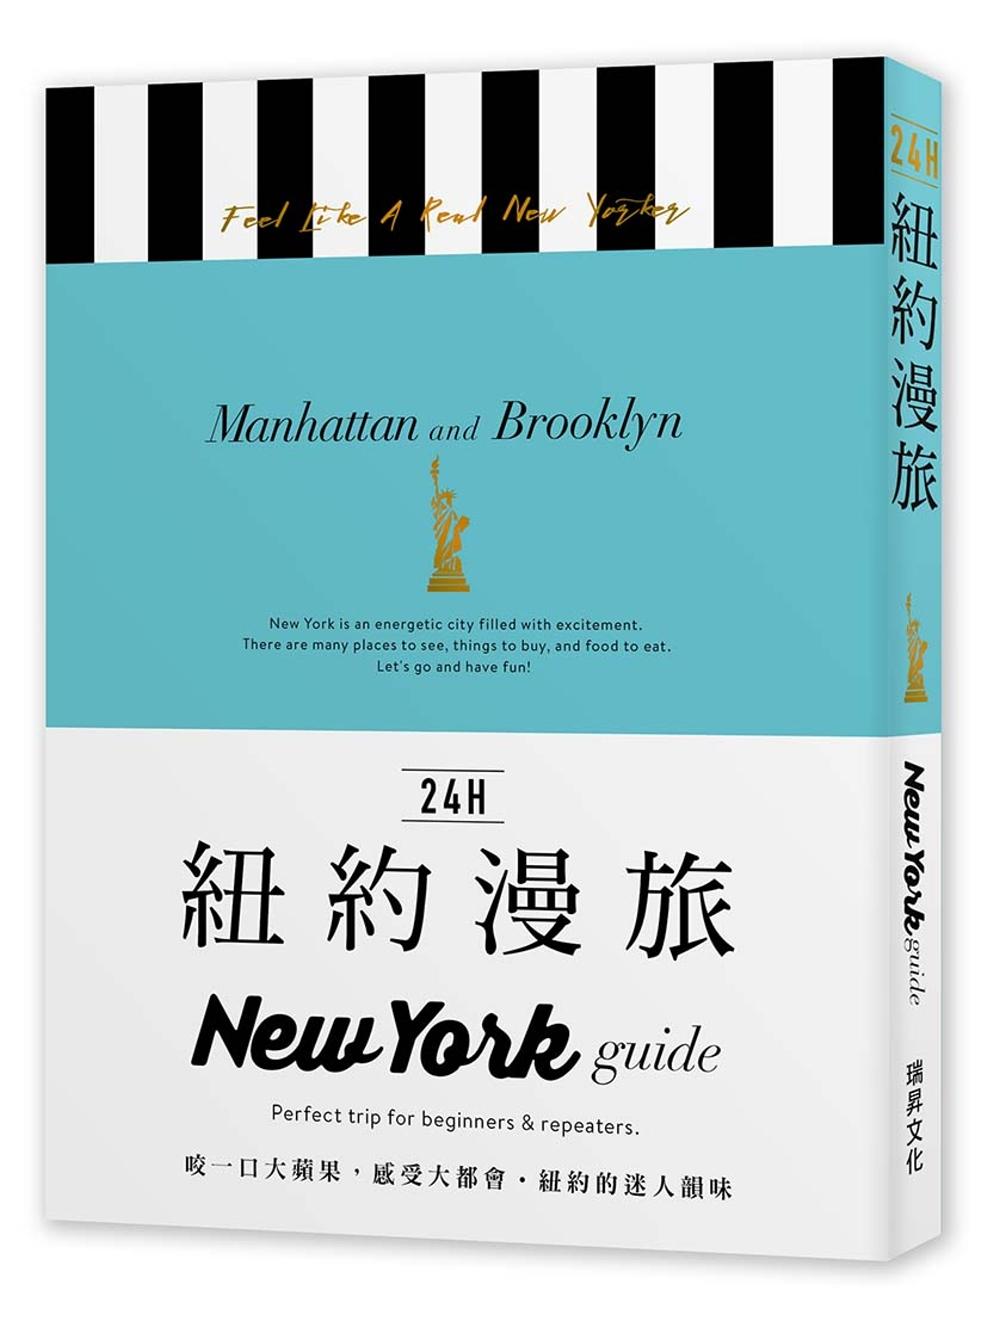 24H紐約漫旅:咬一口大蘋果,感受大都會‧紐約的迷人韻味。探索紐約,在最棒的時間做最棒的事!帶領你暢遊24小時的旅遊導覽書